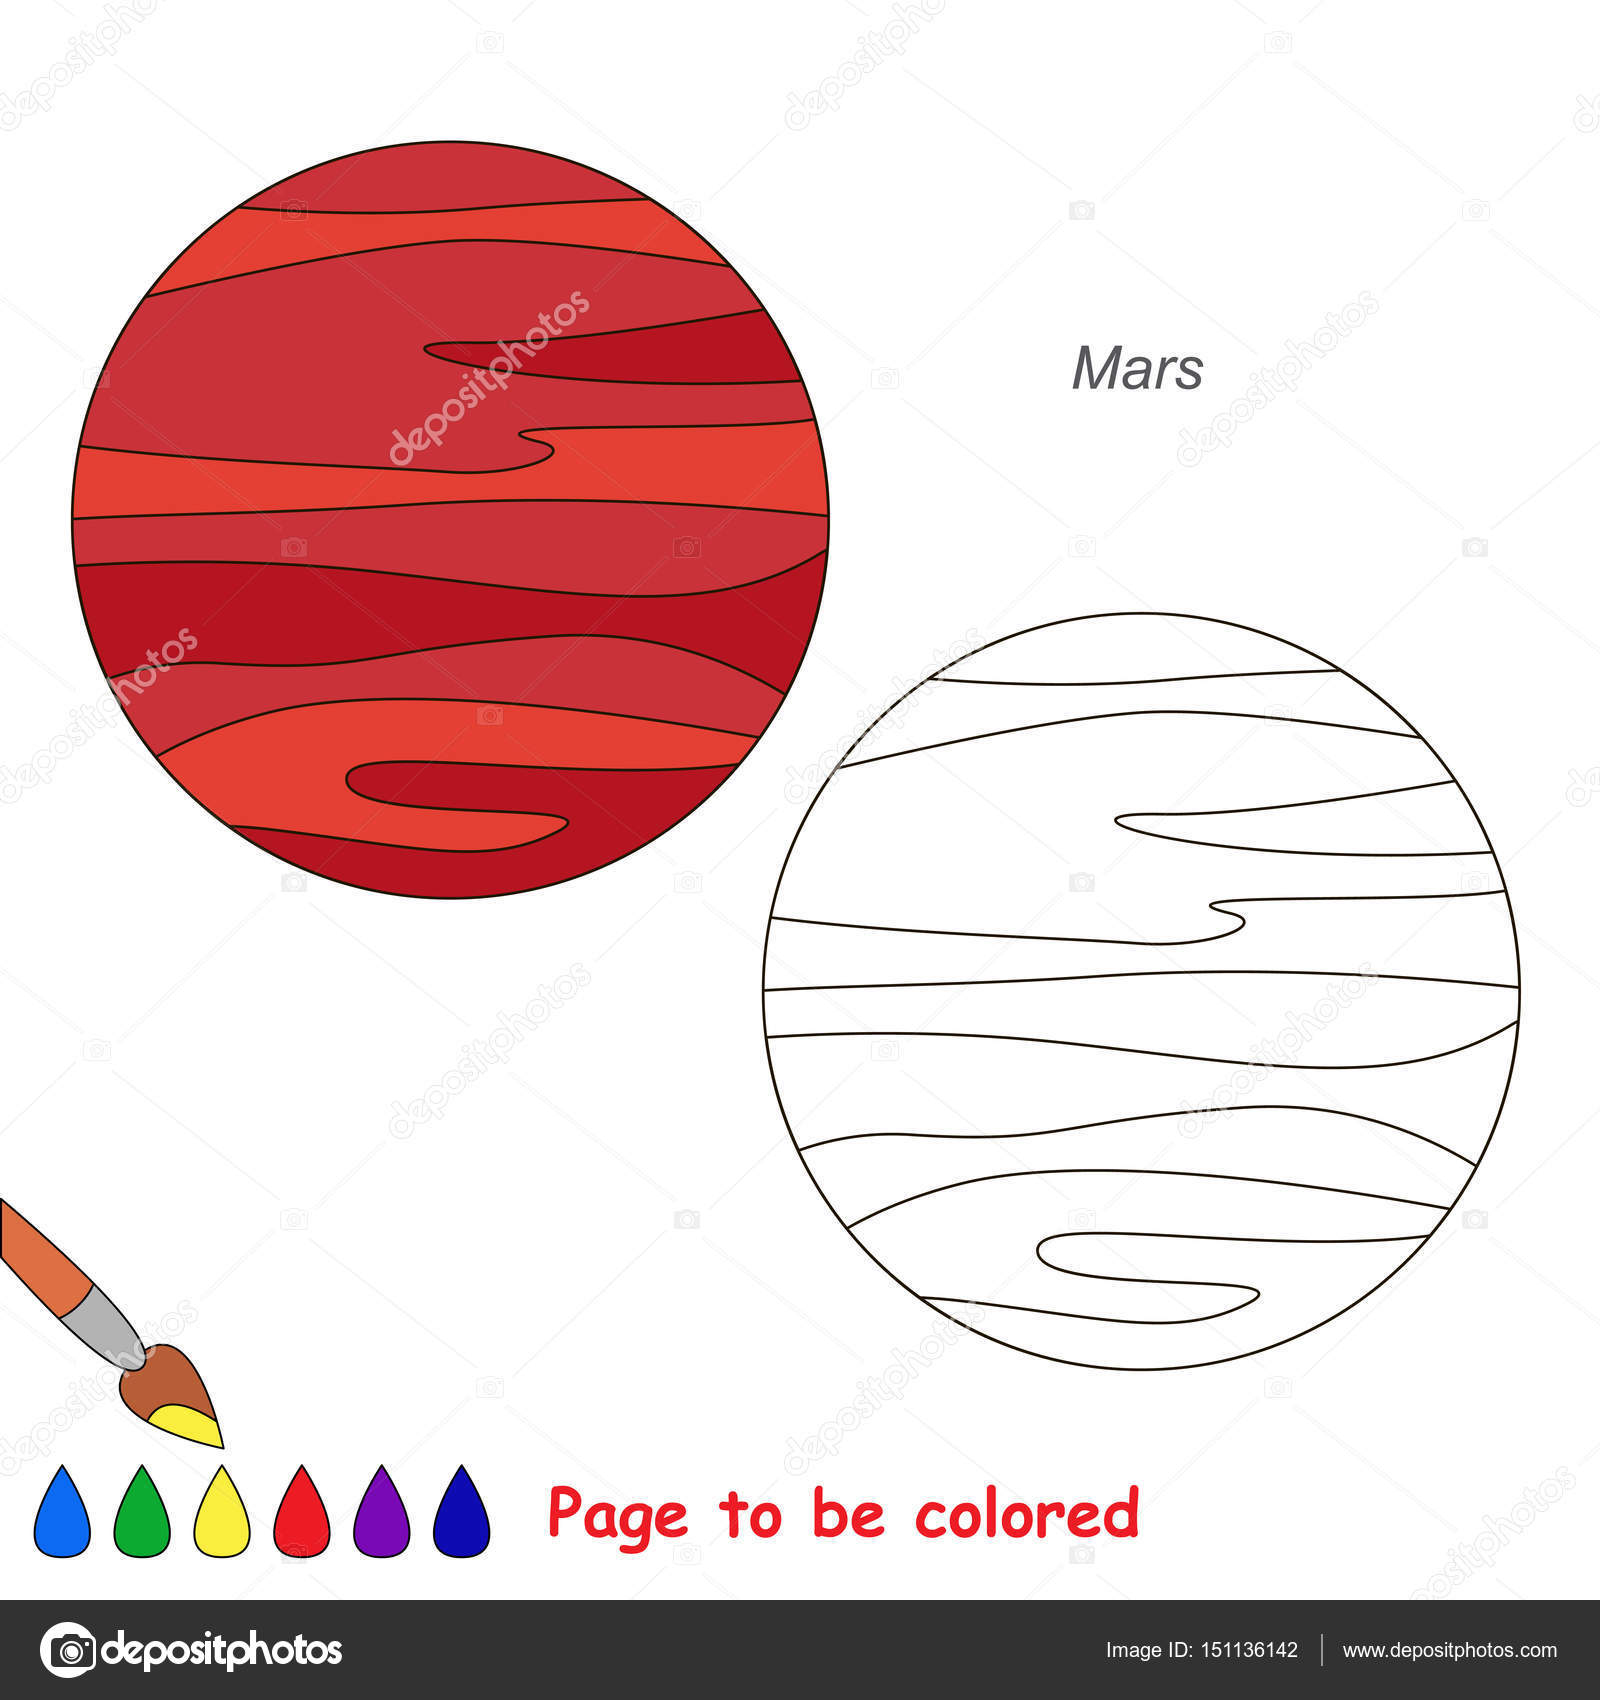 Imagenes Mujeres Para Dibujar Faciles Pagina A Color Simple